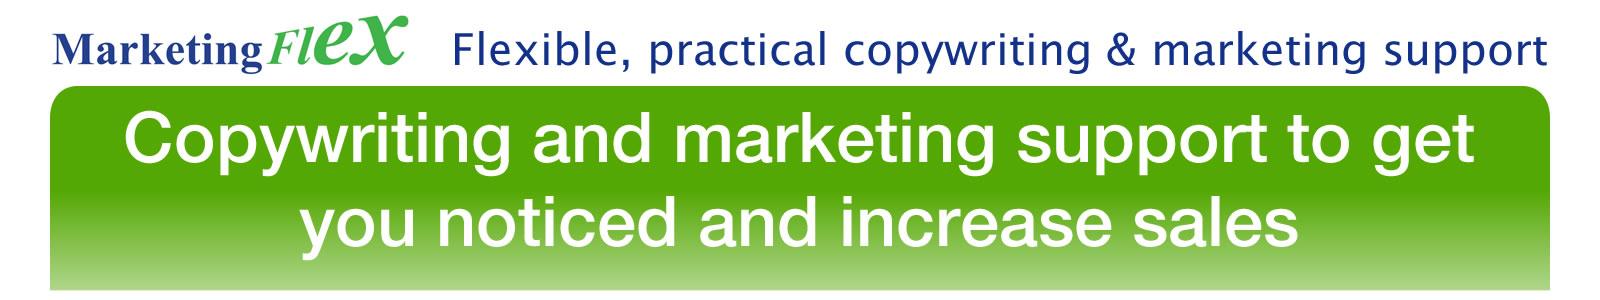 Marketing Flex header image